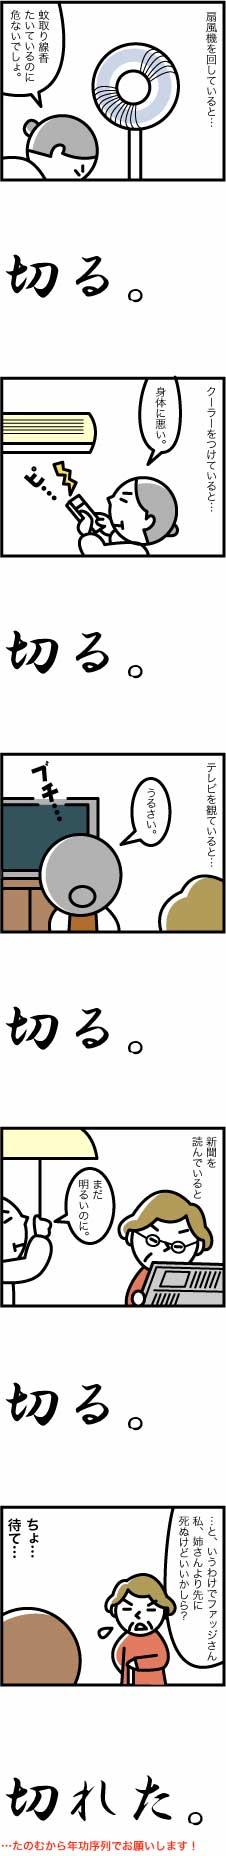 6191_4